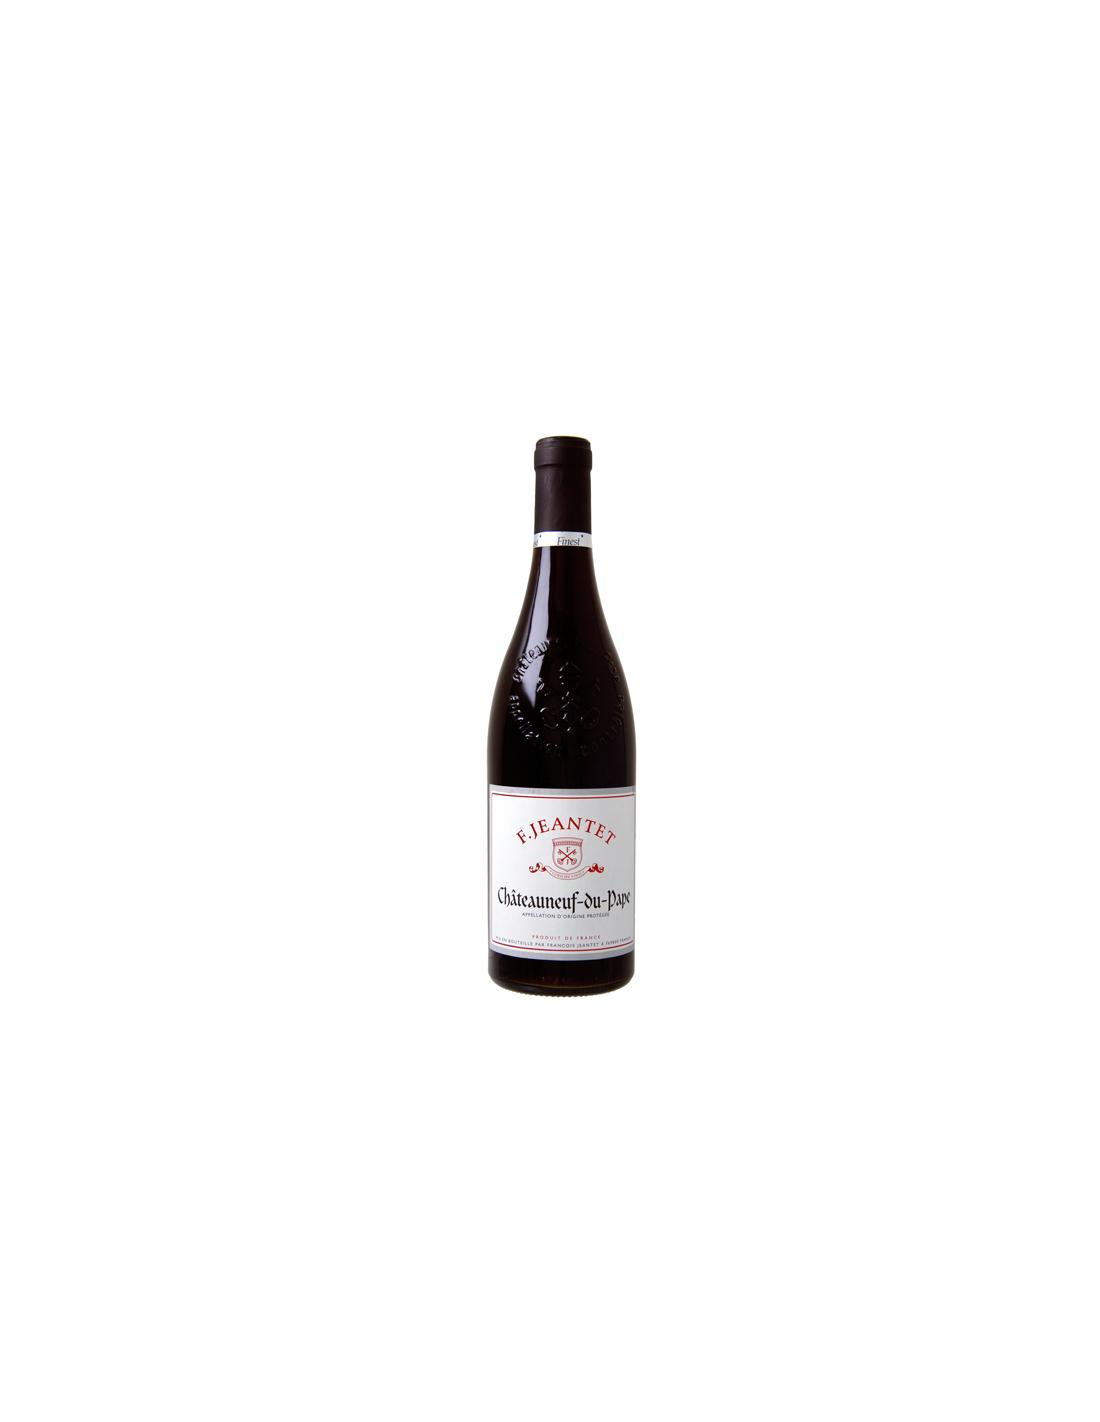 Vin rosu, Cupaj, F. Jeantet Châteauneuf-du-Pape, 0.75L, Franta